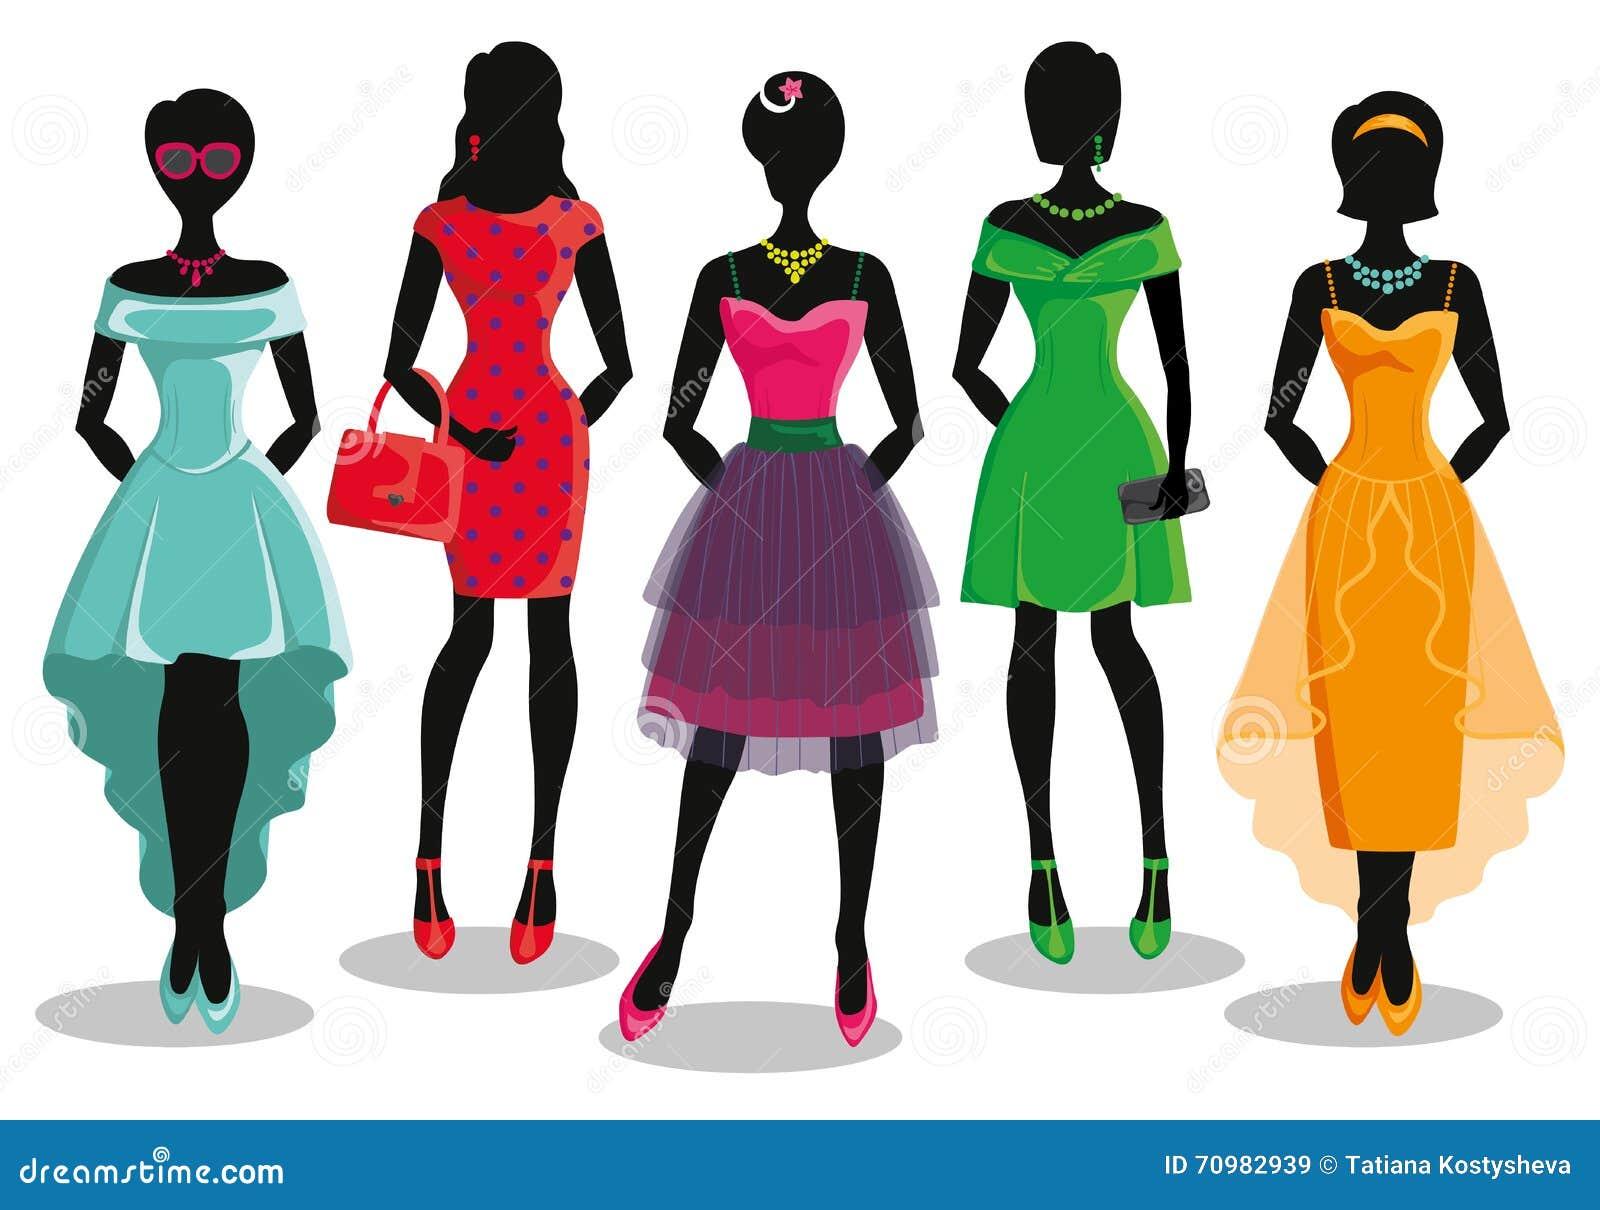 Girl Dresses for Sale